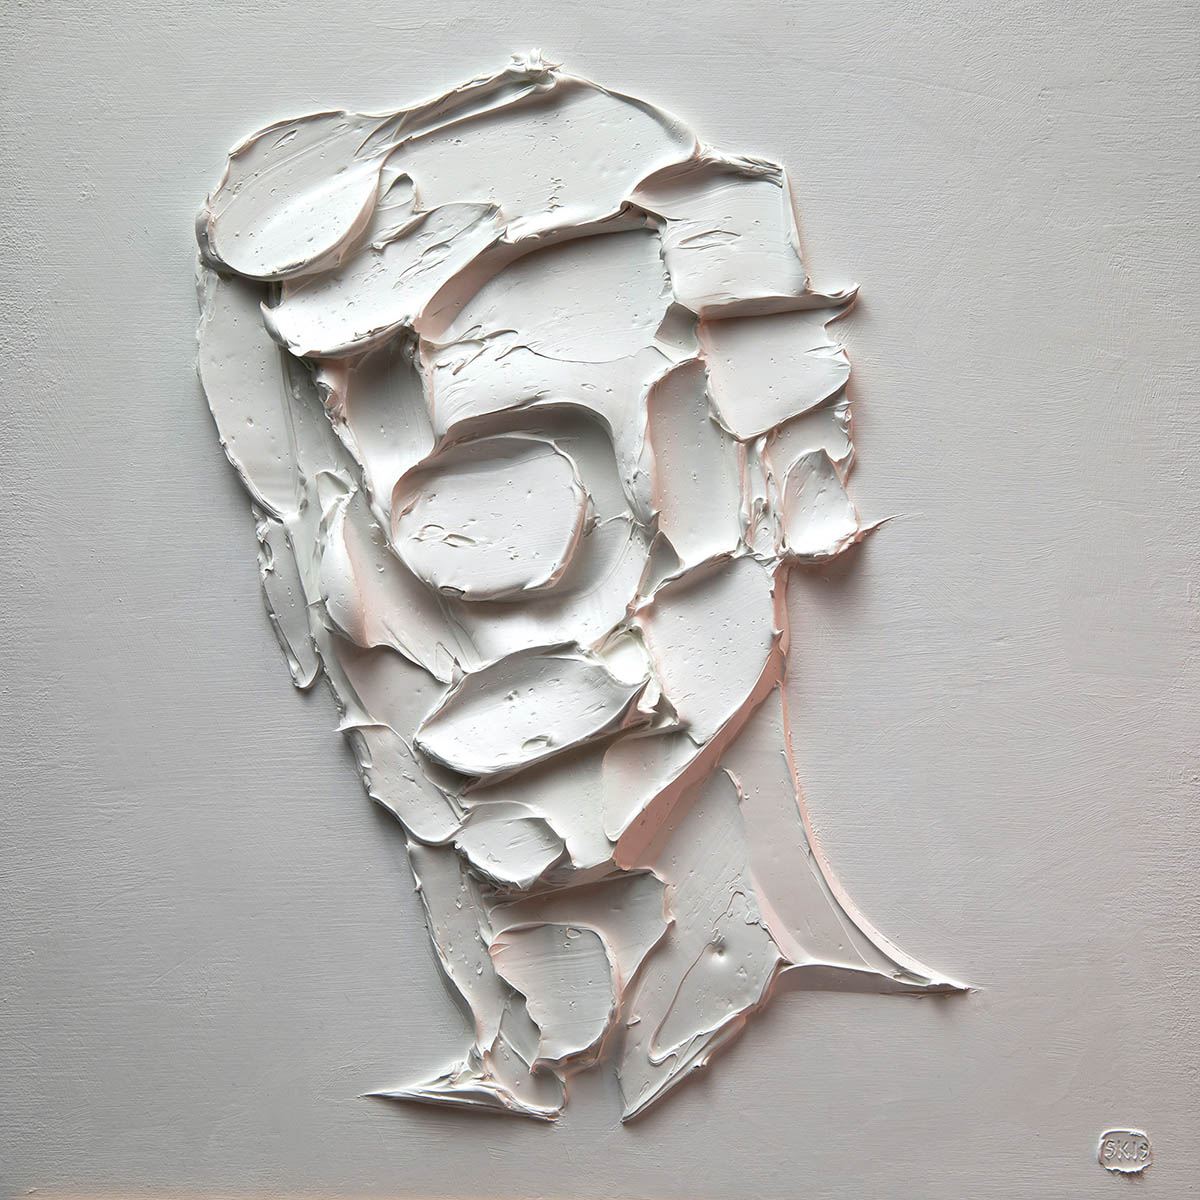 Salman Khoshroo, WOWBA-11, Knife Impasto, oil on wood panel, 30 x 30cm